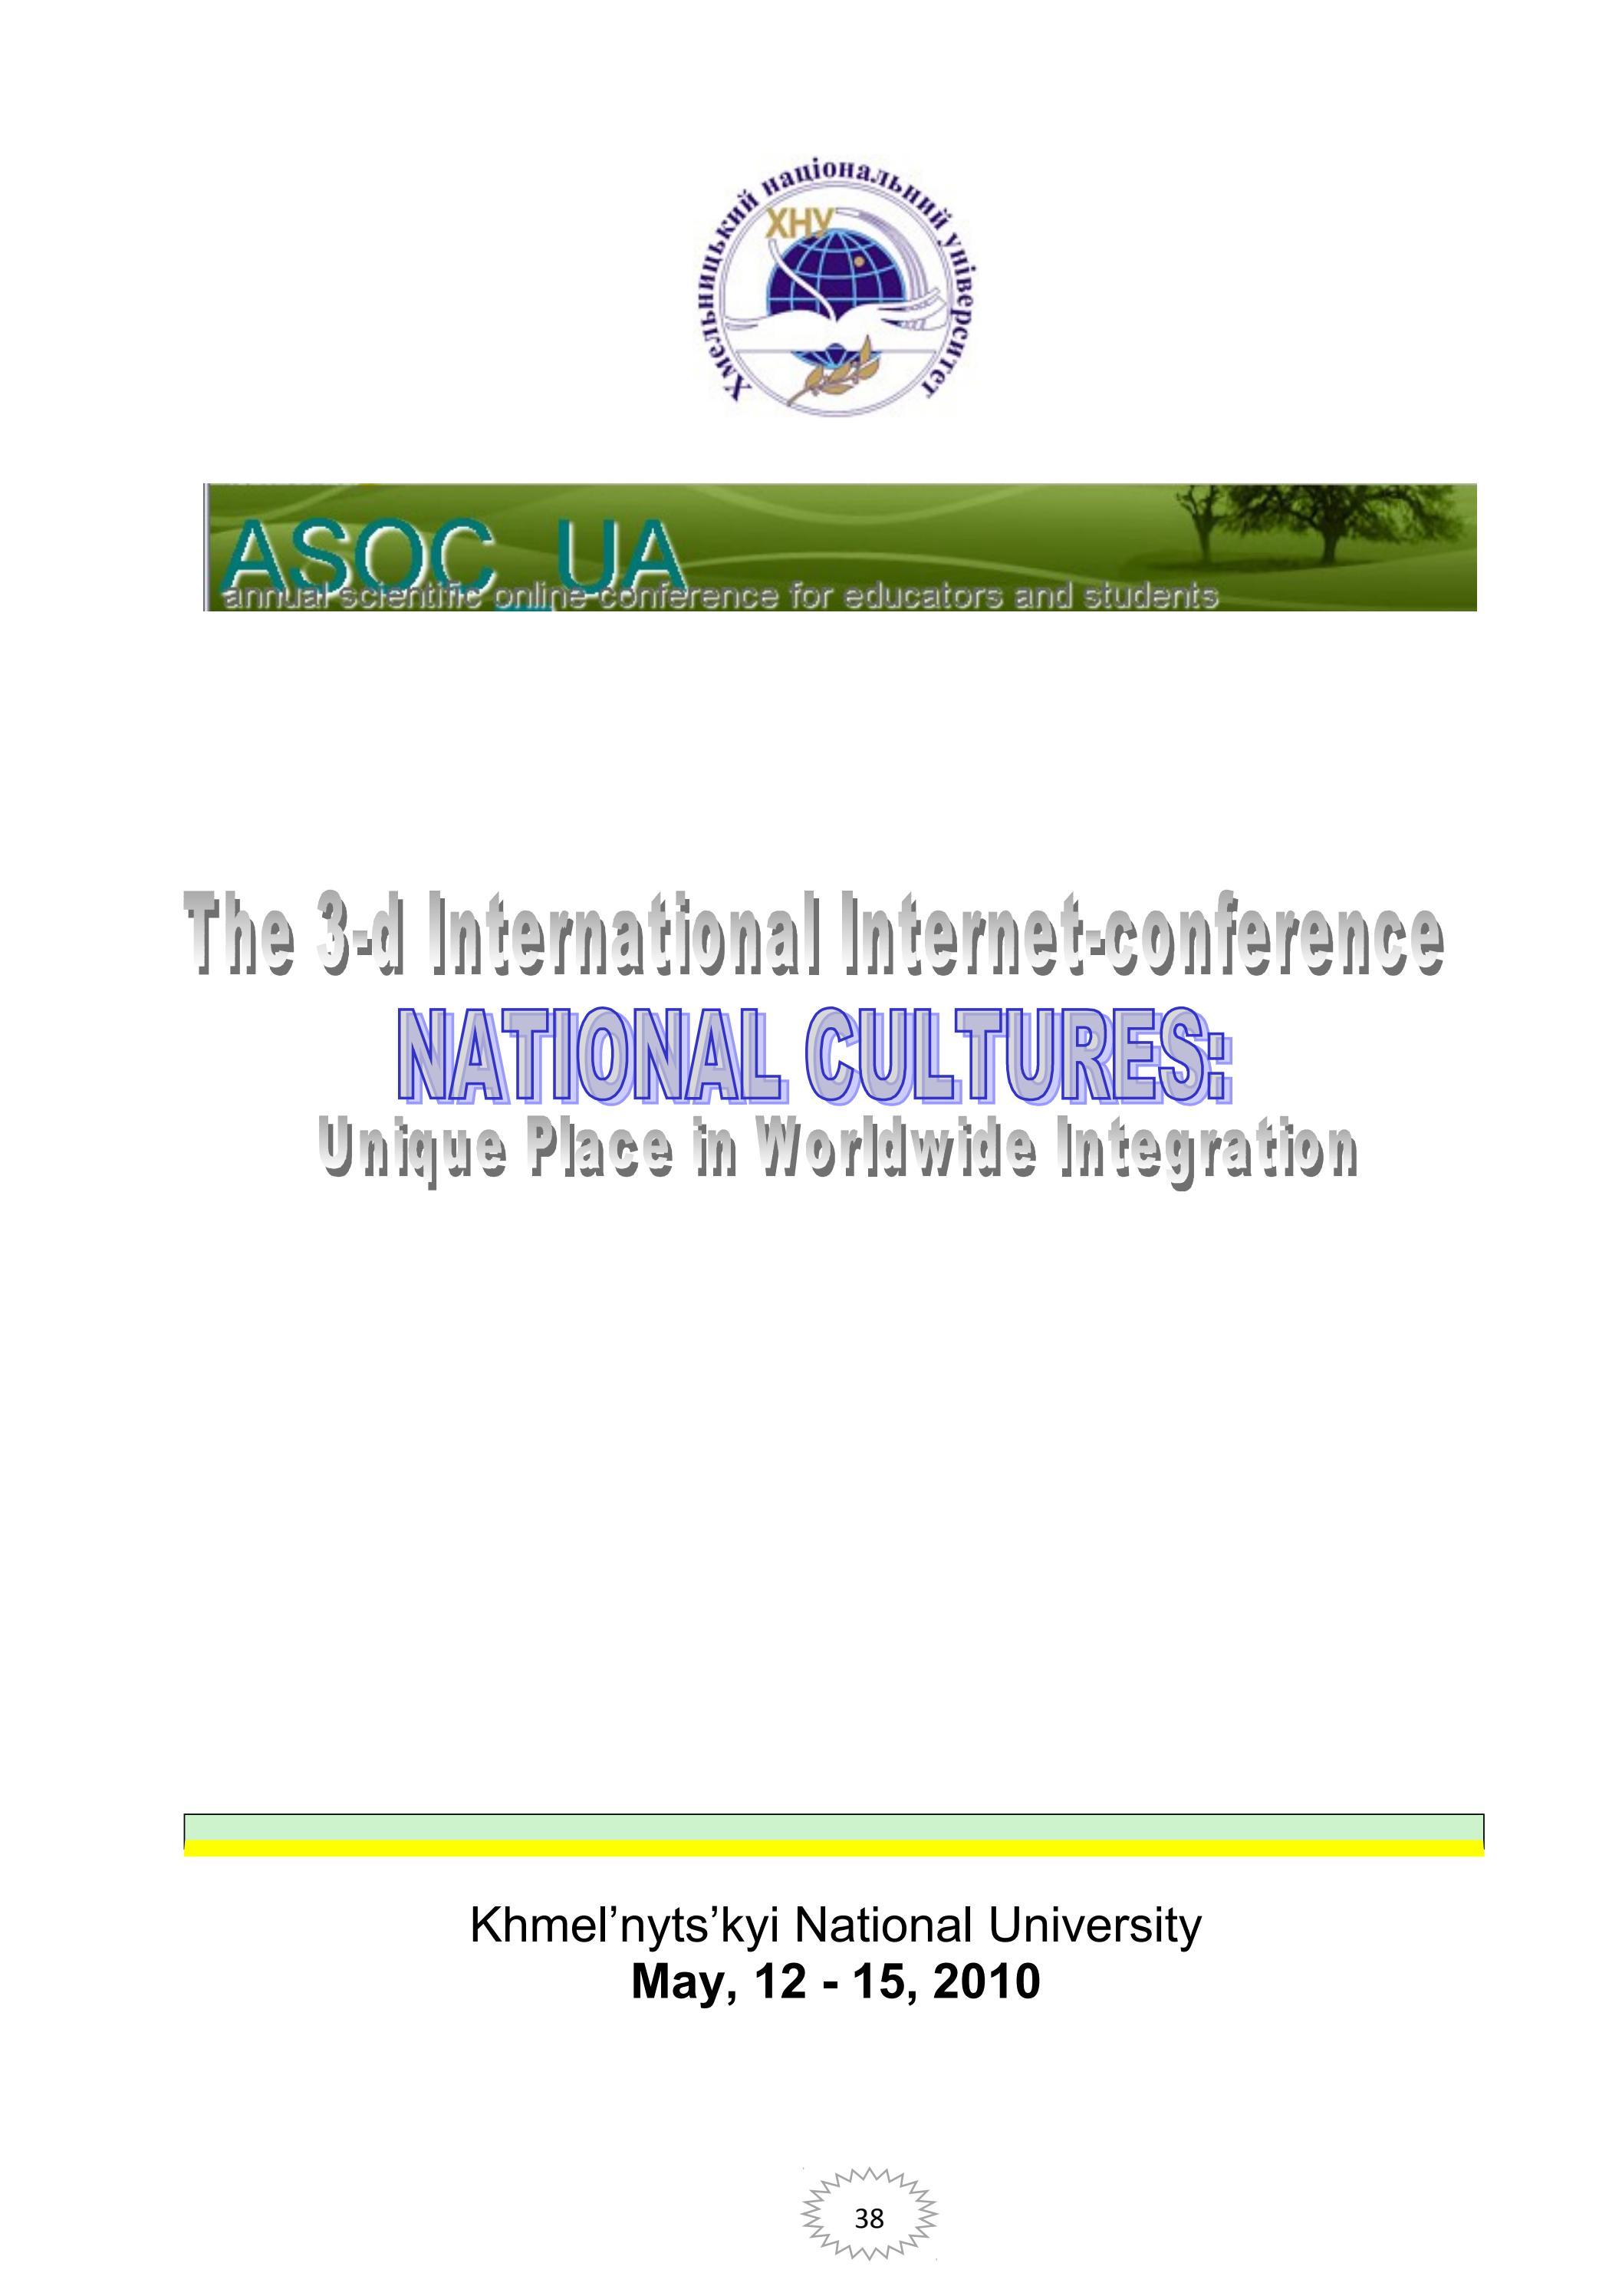 ASOC_UA: Conference Materials by Nina Gora - issuu